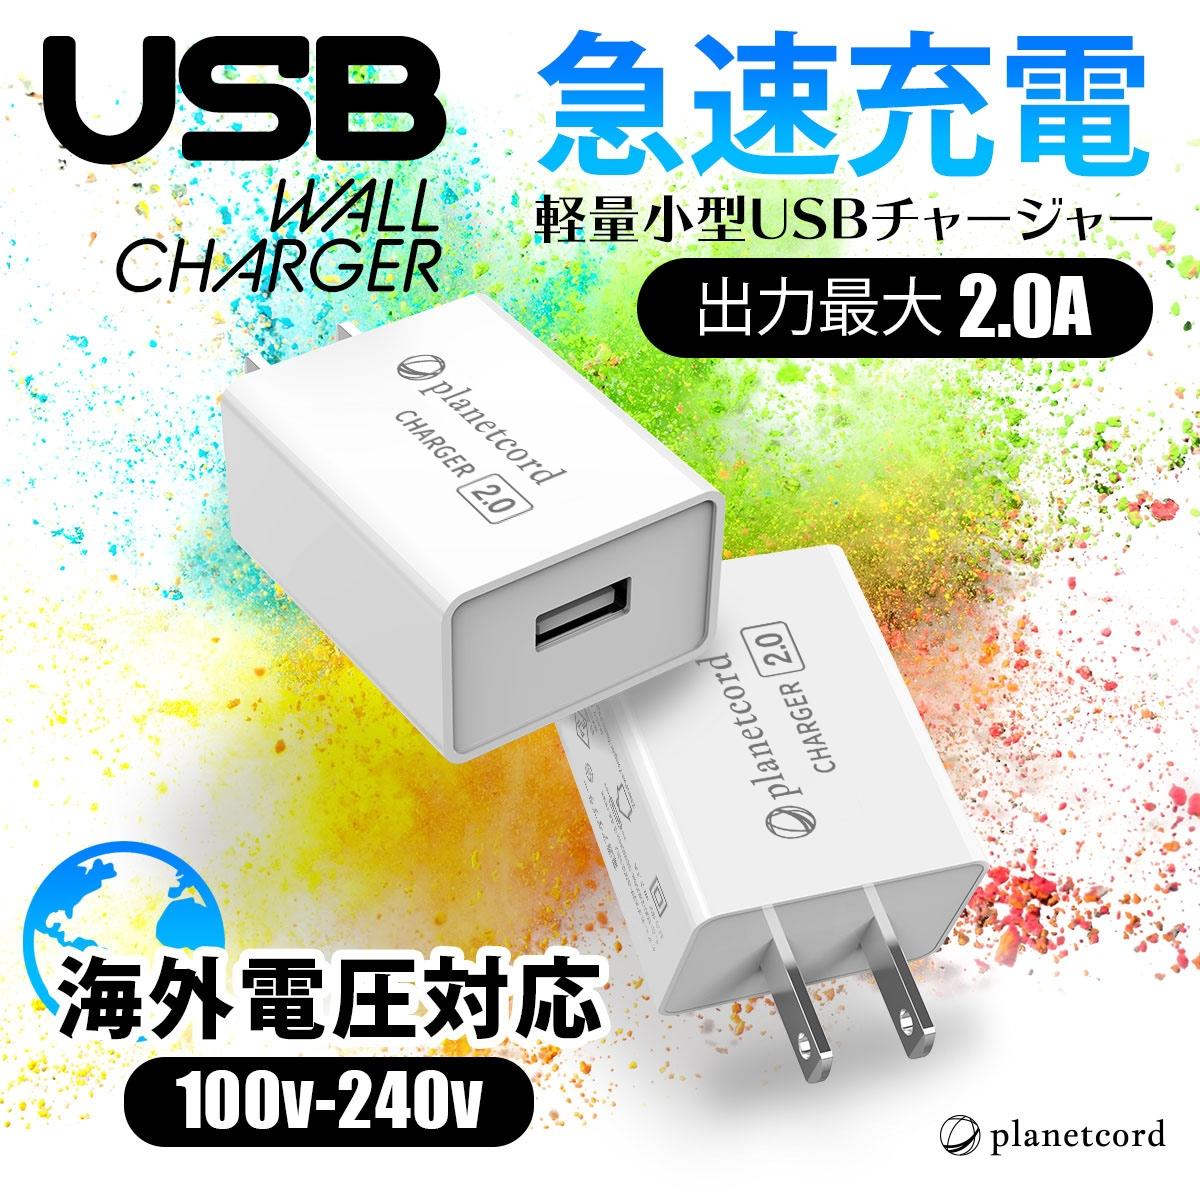 ACアダプター iPhone USB 充電器 高速充電 iPad スマホ タブレット Android 各種対応 コンセント コンパクト 持ち運び PSE認証 送料無料 ポイント消化